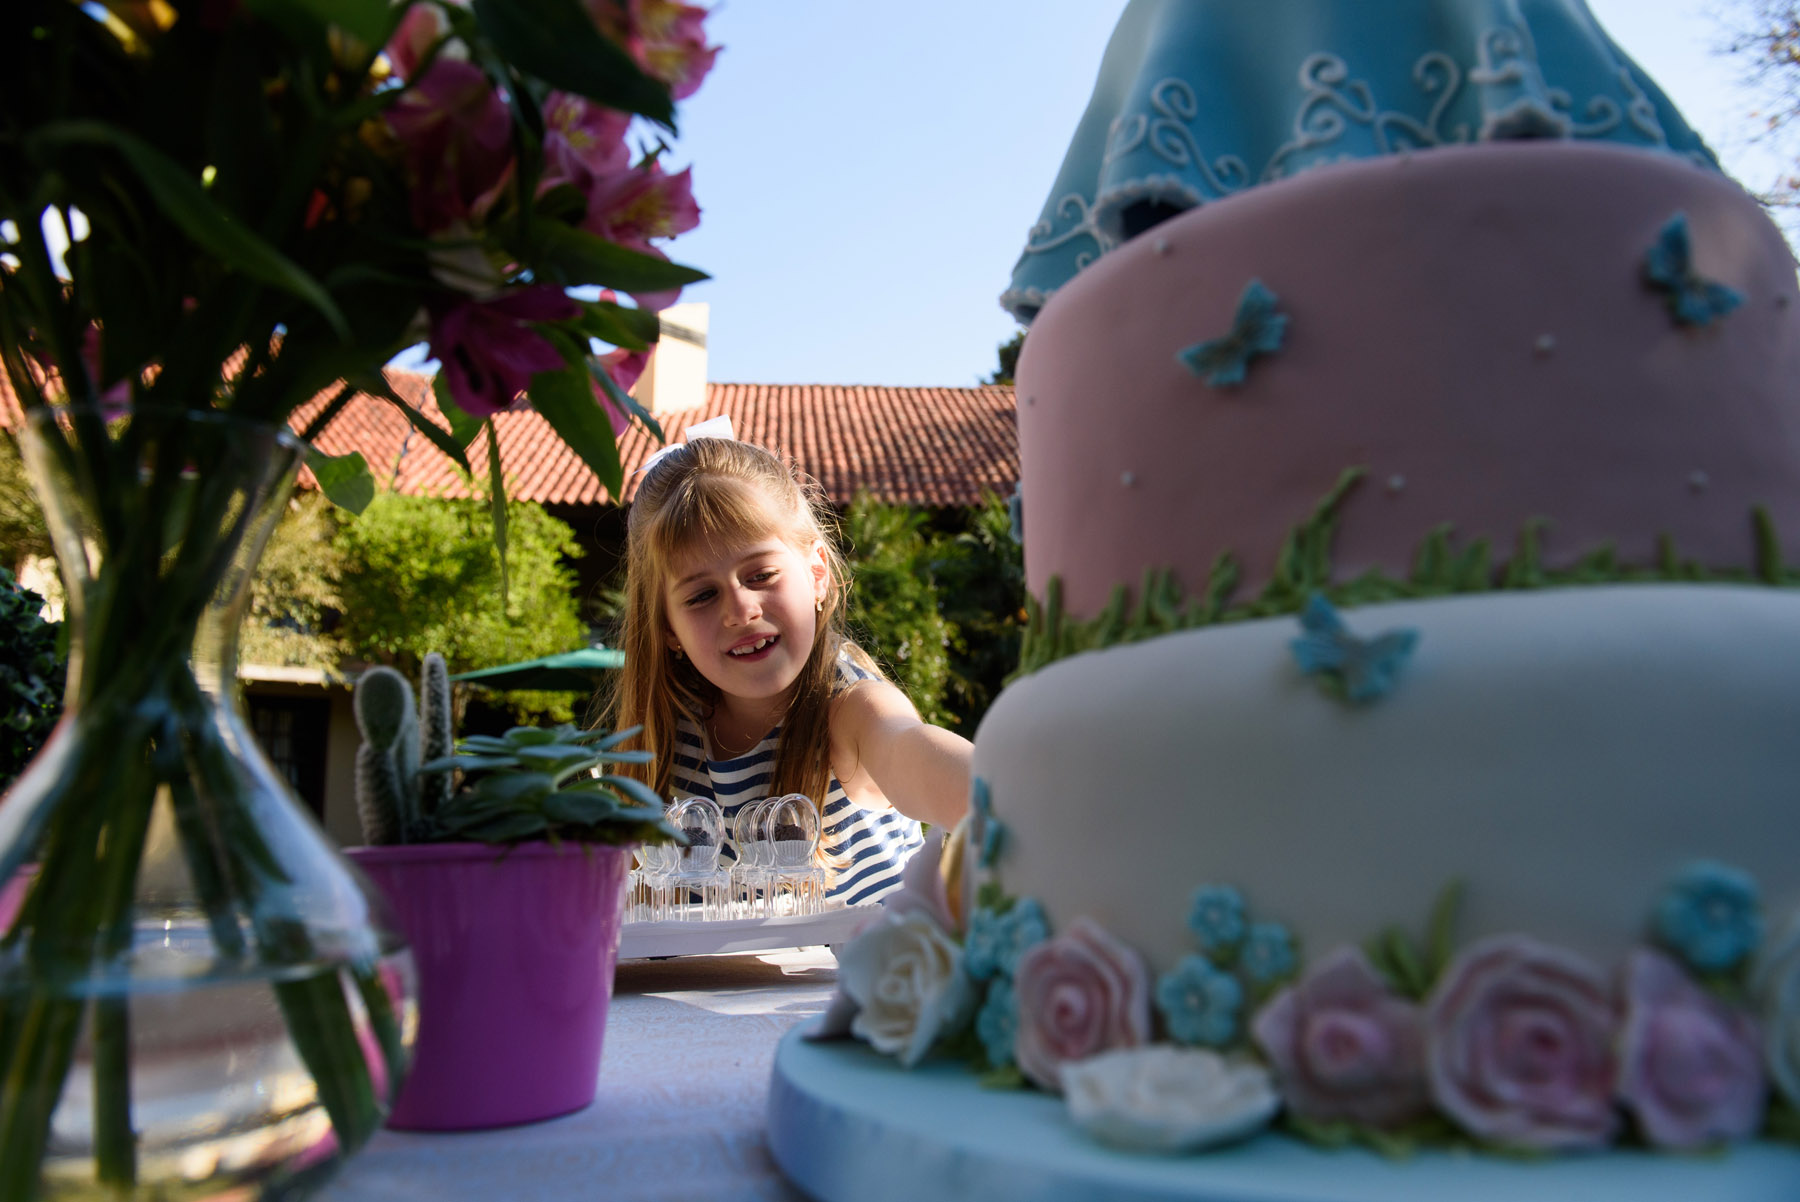 12-aniversario-infantil-curitiba-fotografo-infantil-festa-infantil-curitiba-alice.jpg